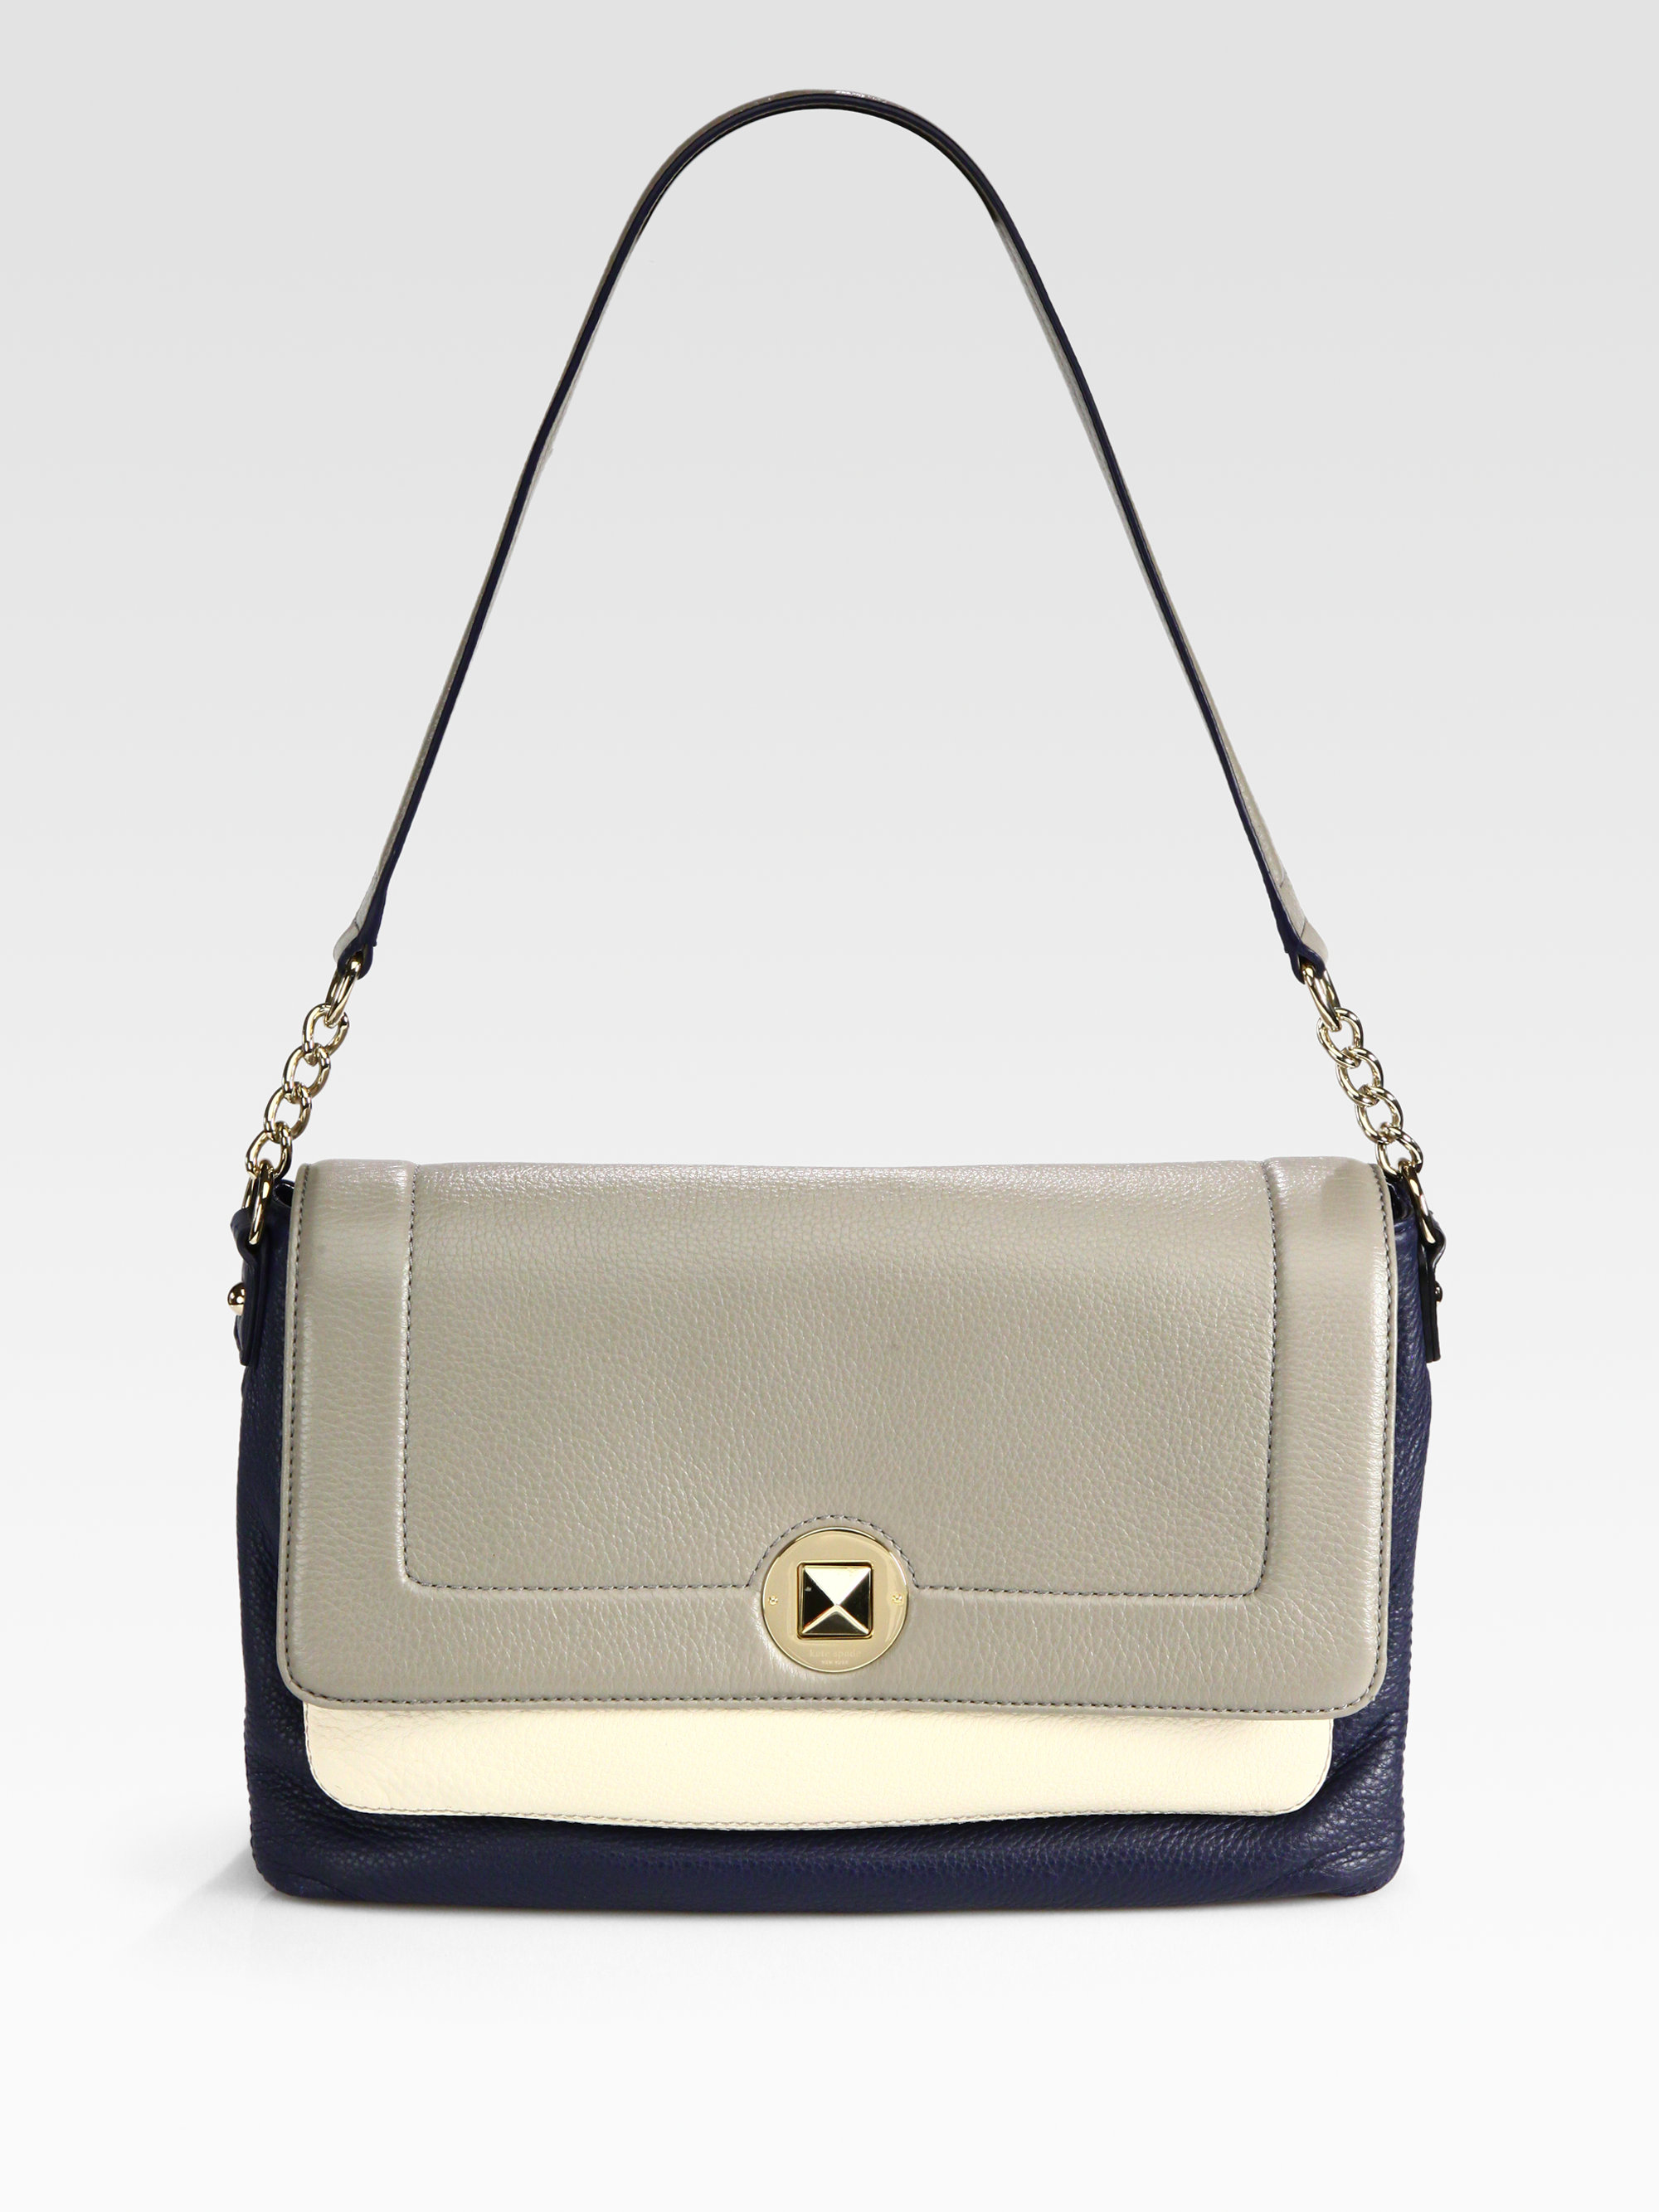 1d6c2d69d8ab Lyst - Kate Spade Lottie Colorblock Shoulder Bag in Metallic